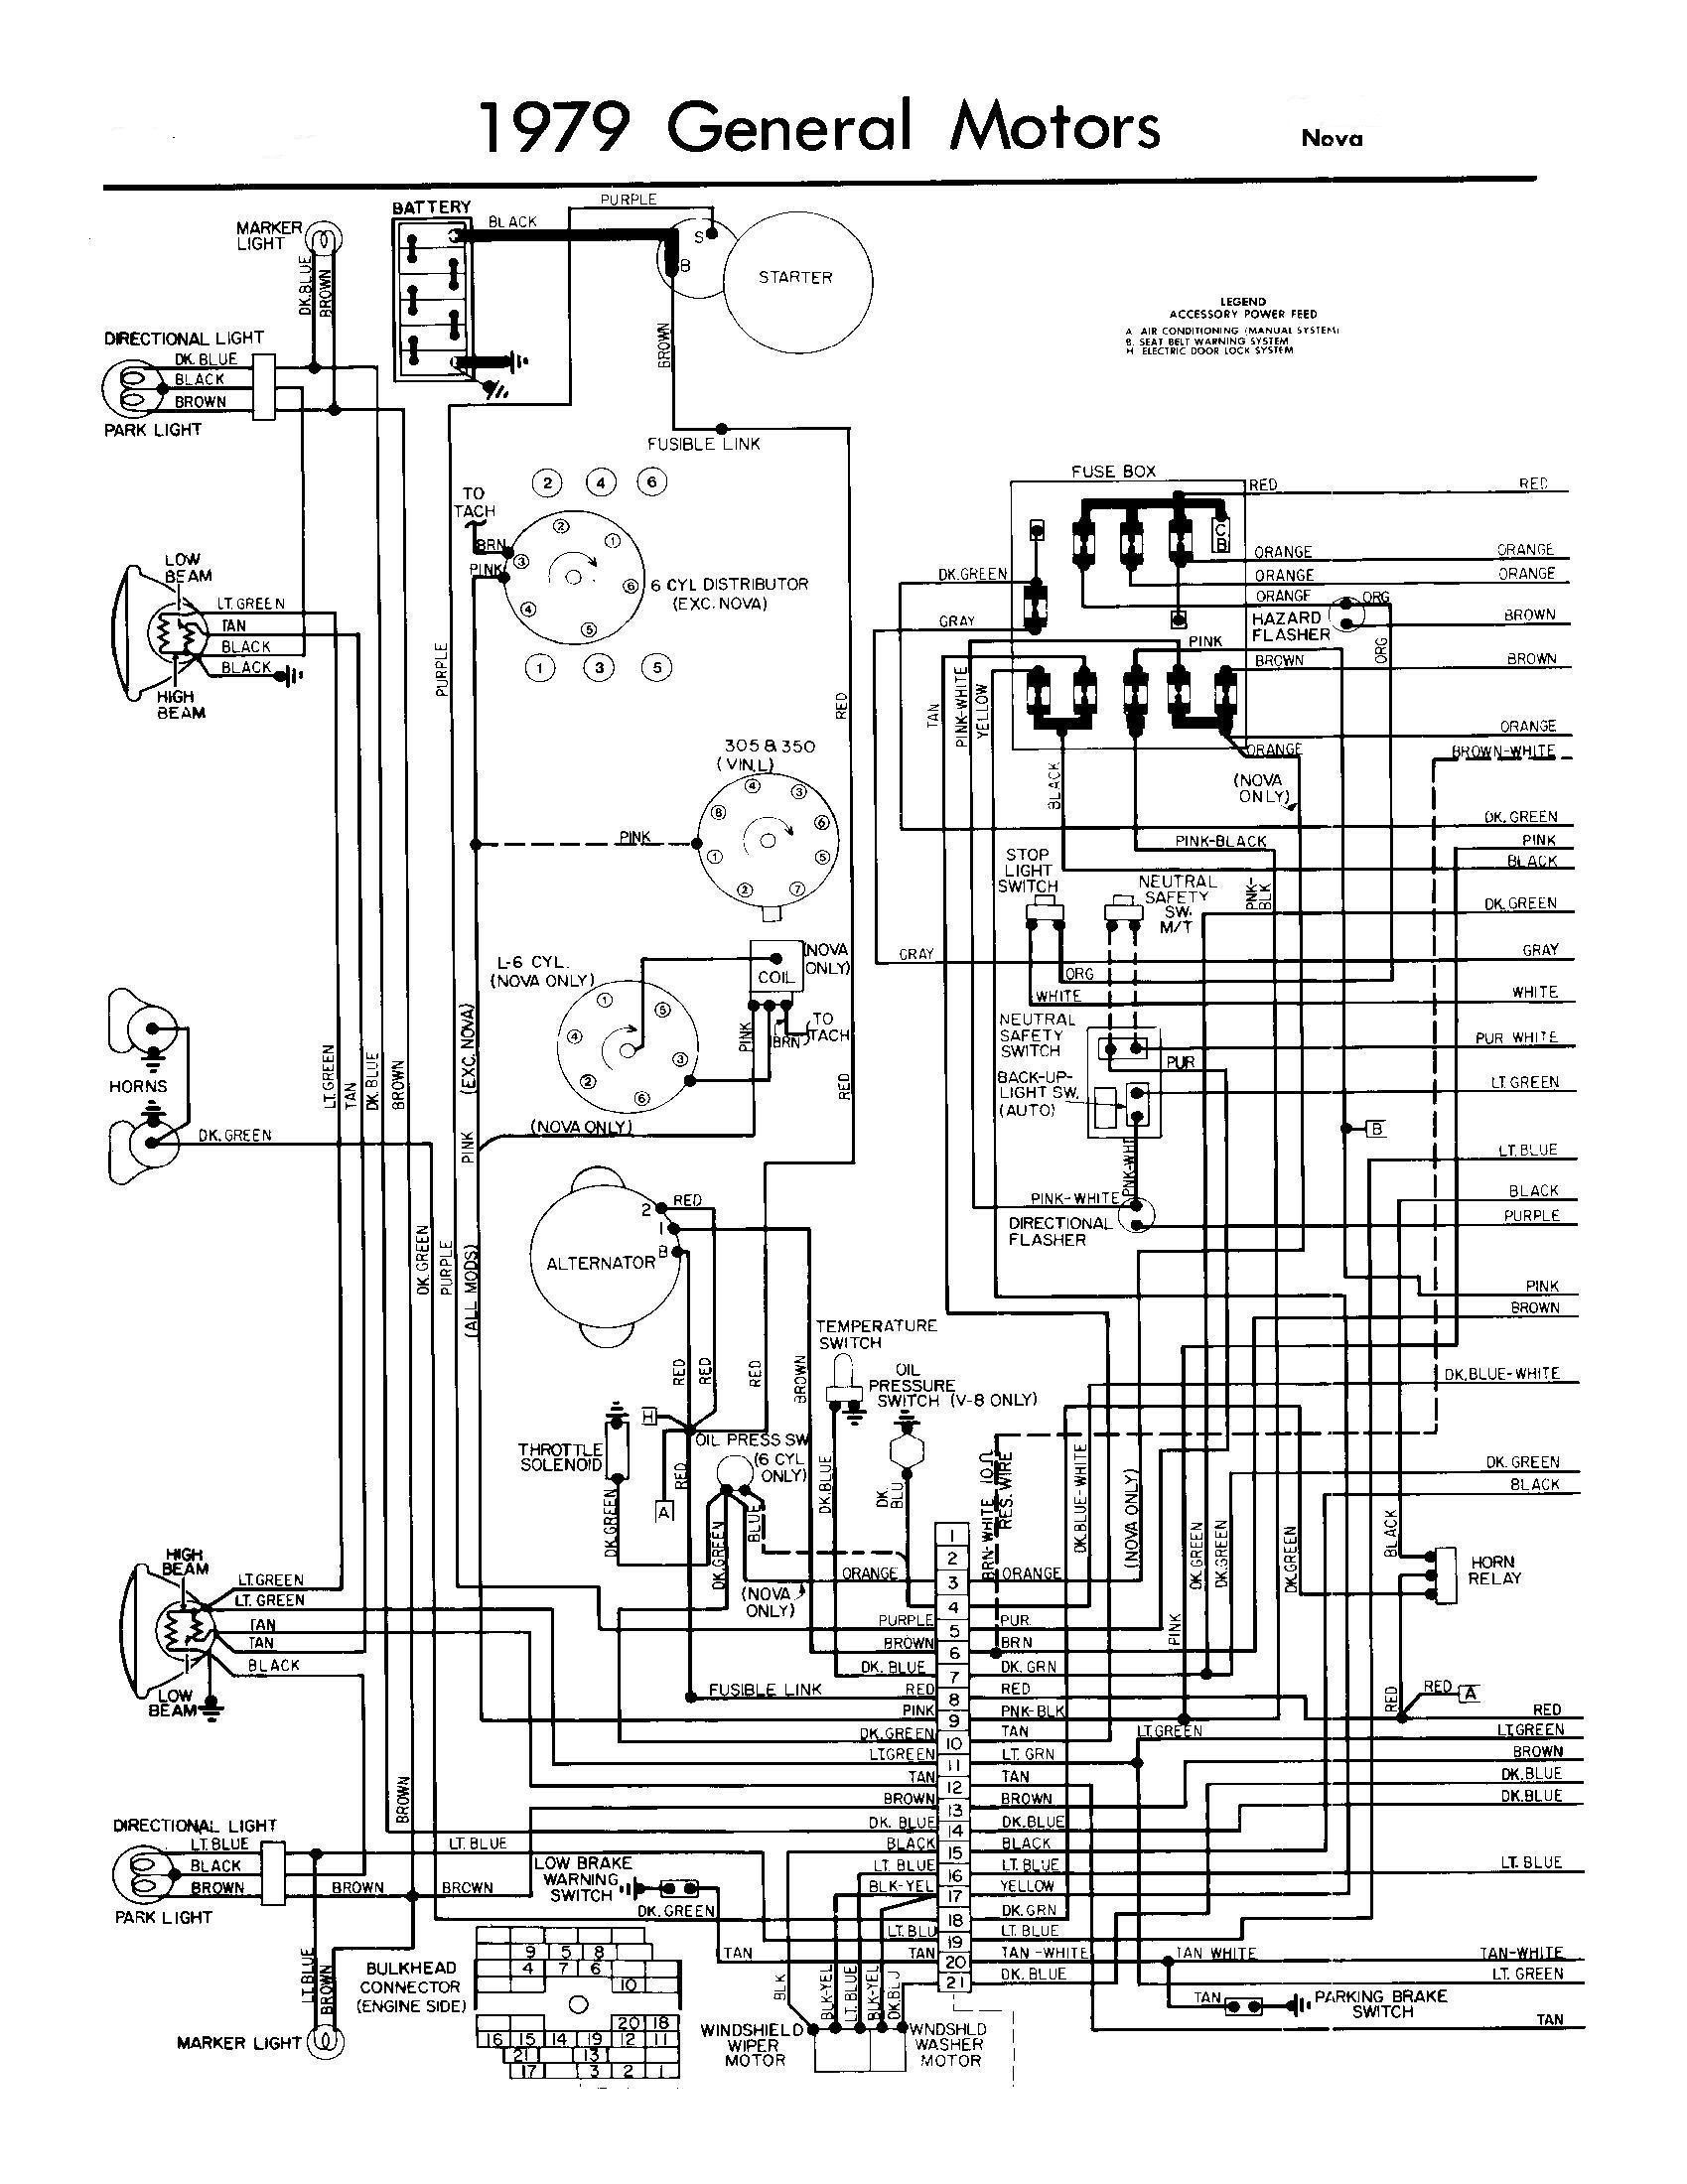 1998 Chevy Silverado Brake Light Wiring Diagram Suburban Parts Gm All Generation Schematics Nova Forum Of